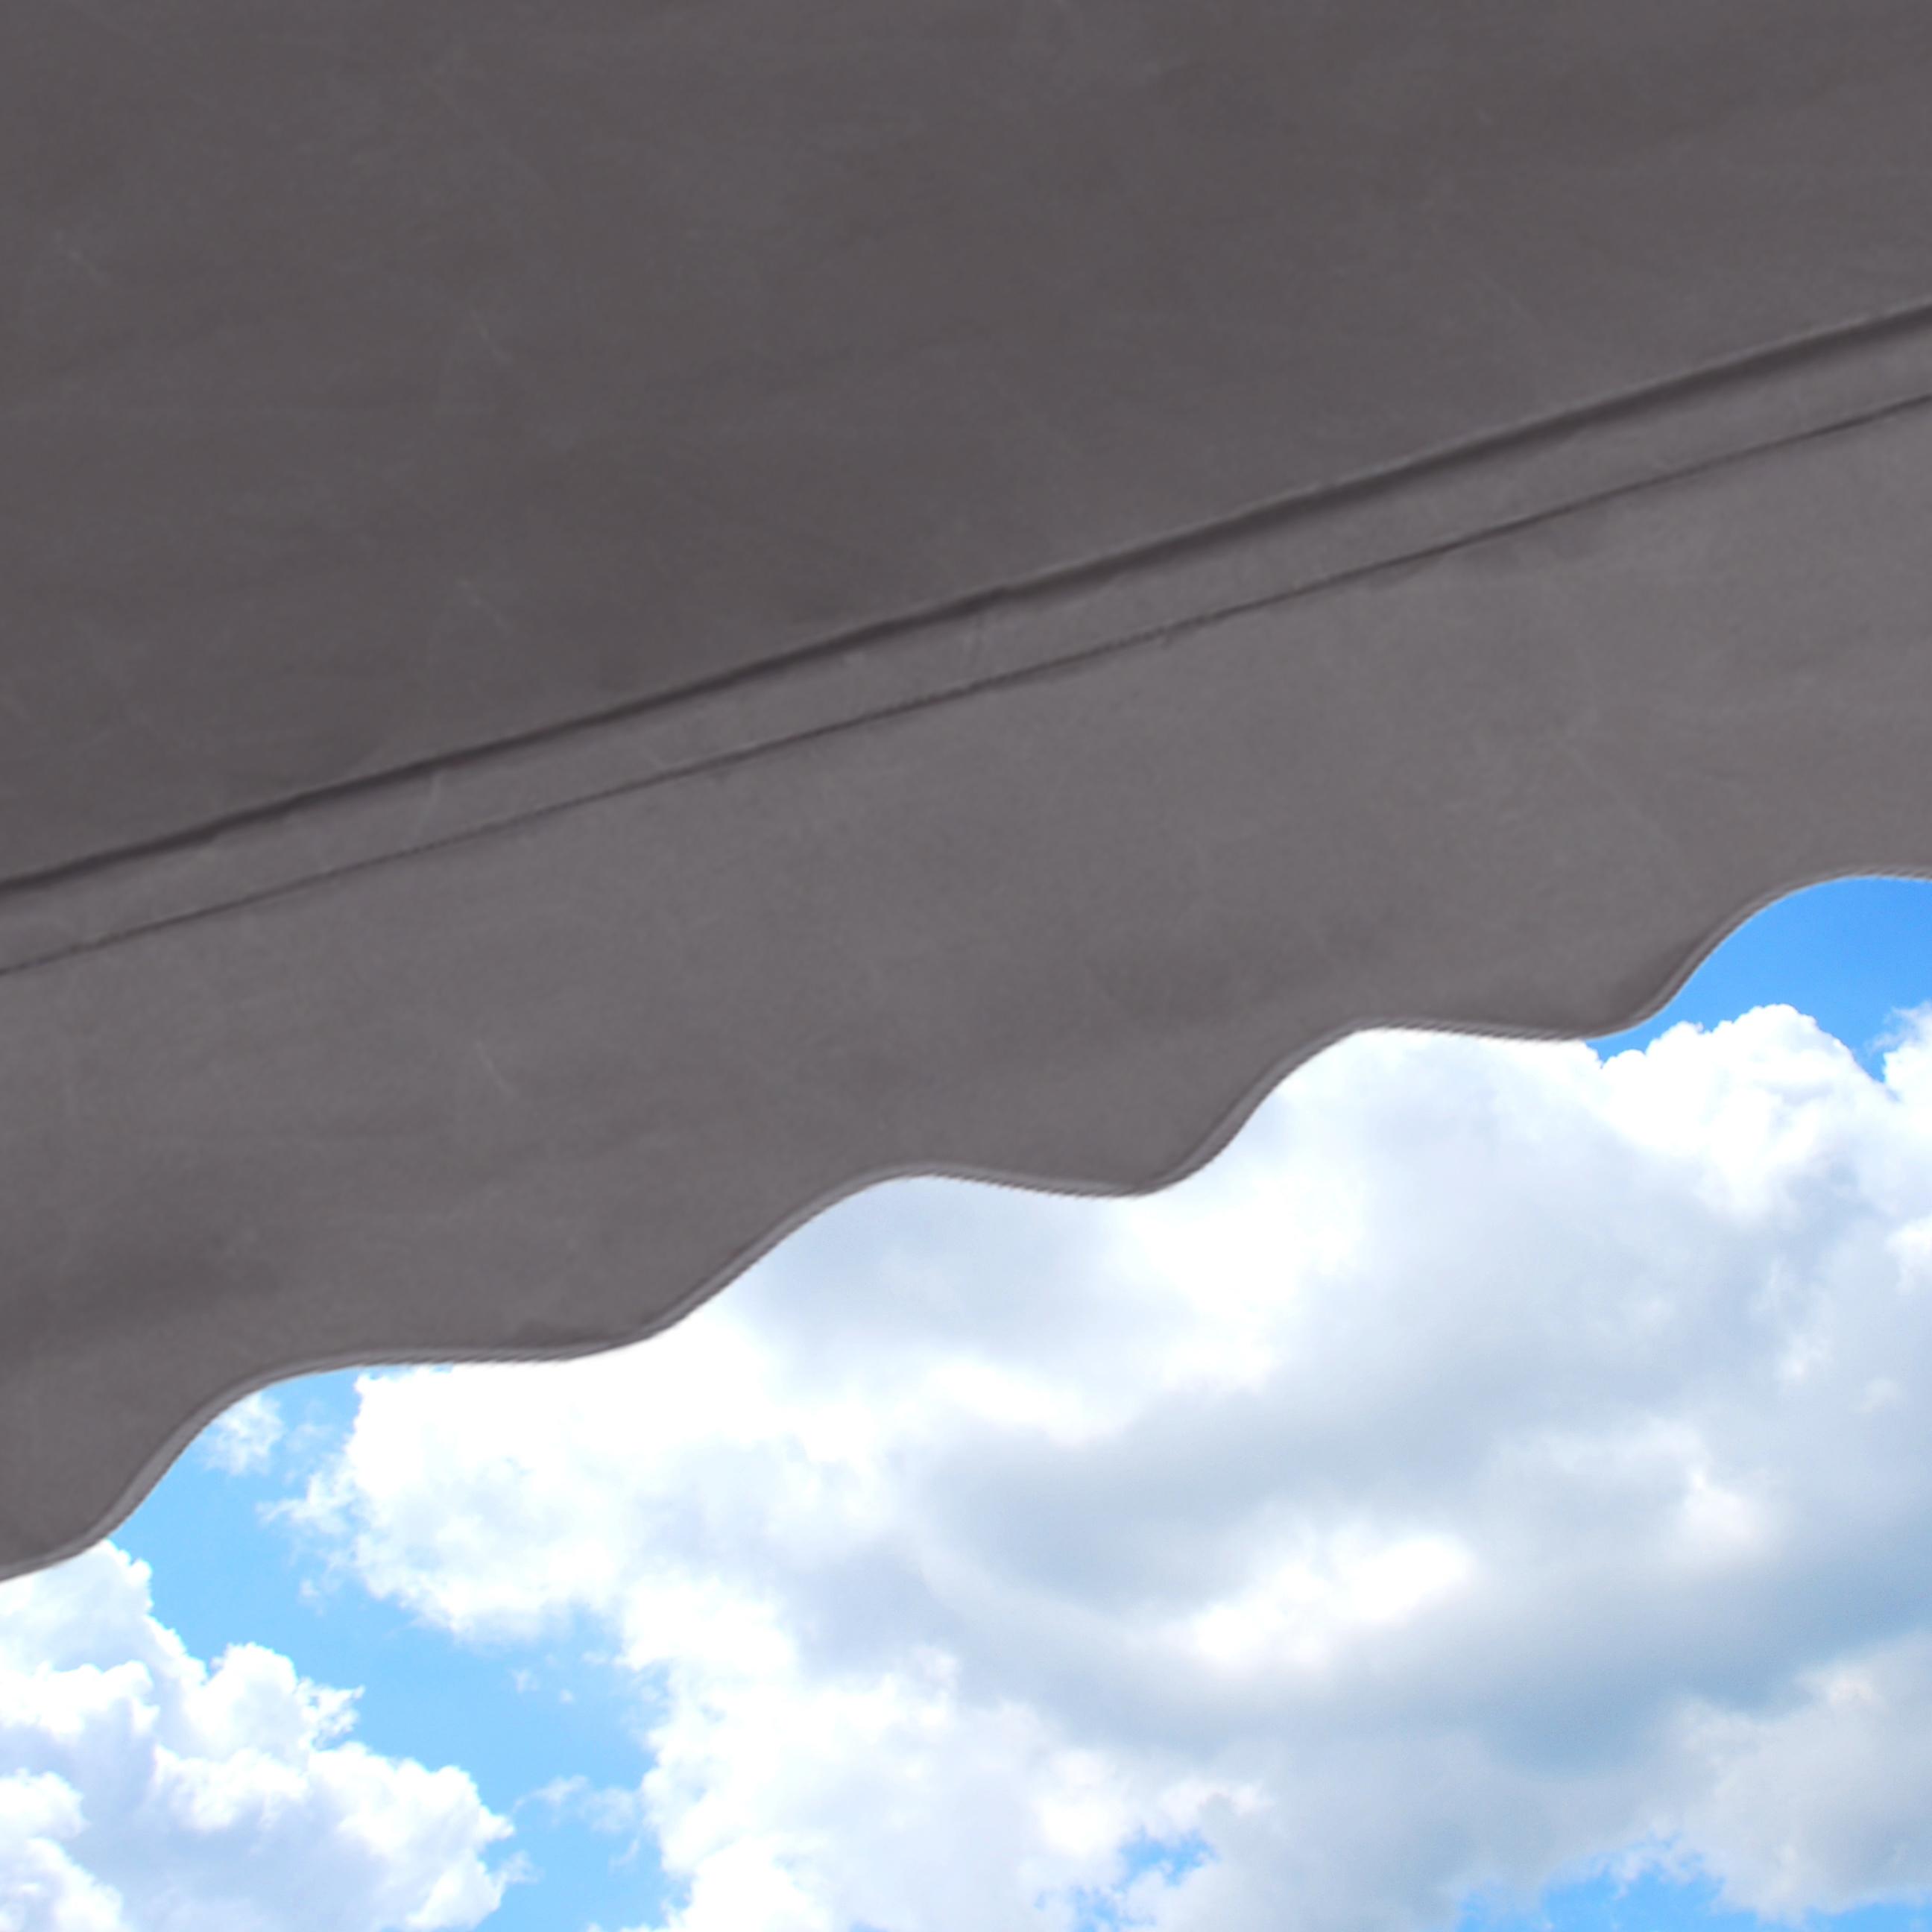 Super Klemmmarkise Balkon Markise Balkonmarkise Sonnenmarkise Sonnendach IU59